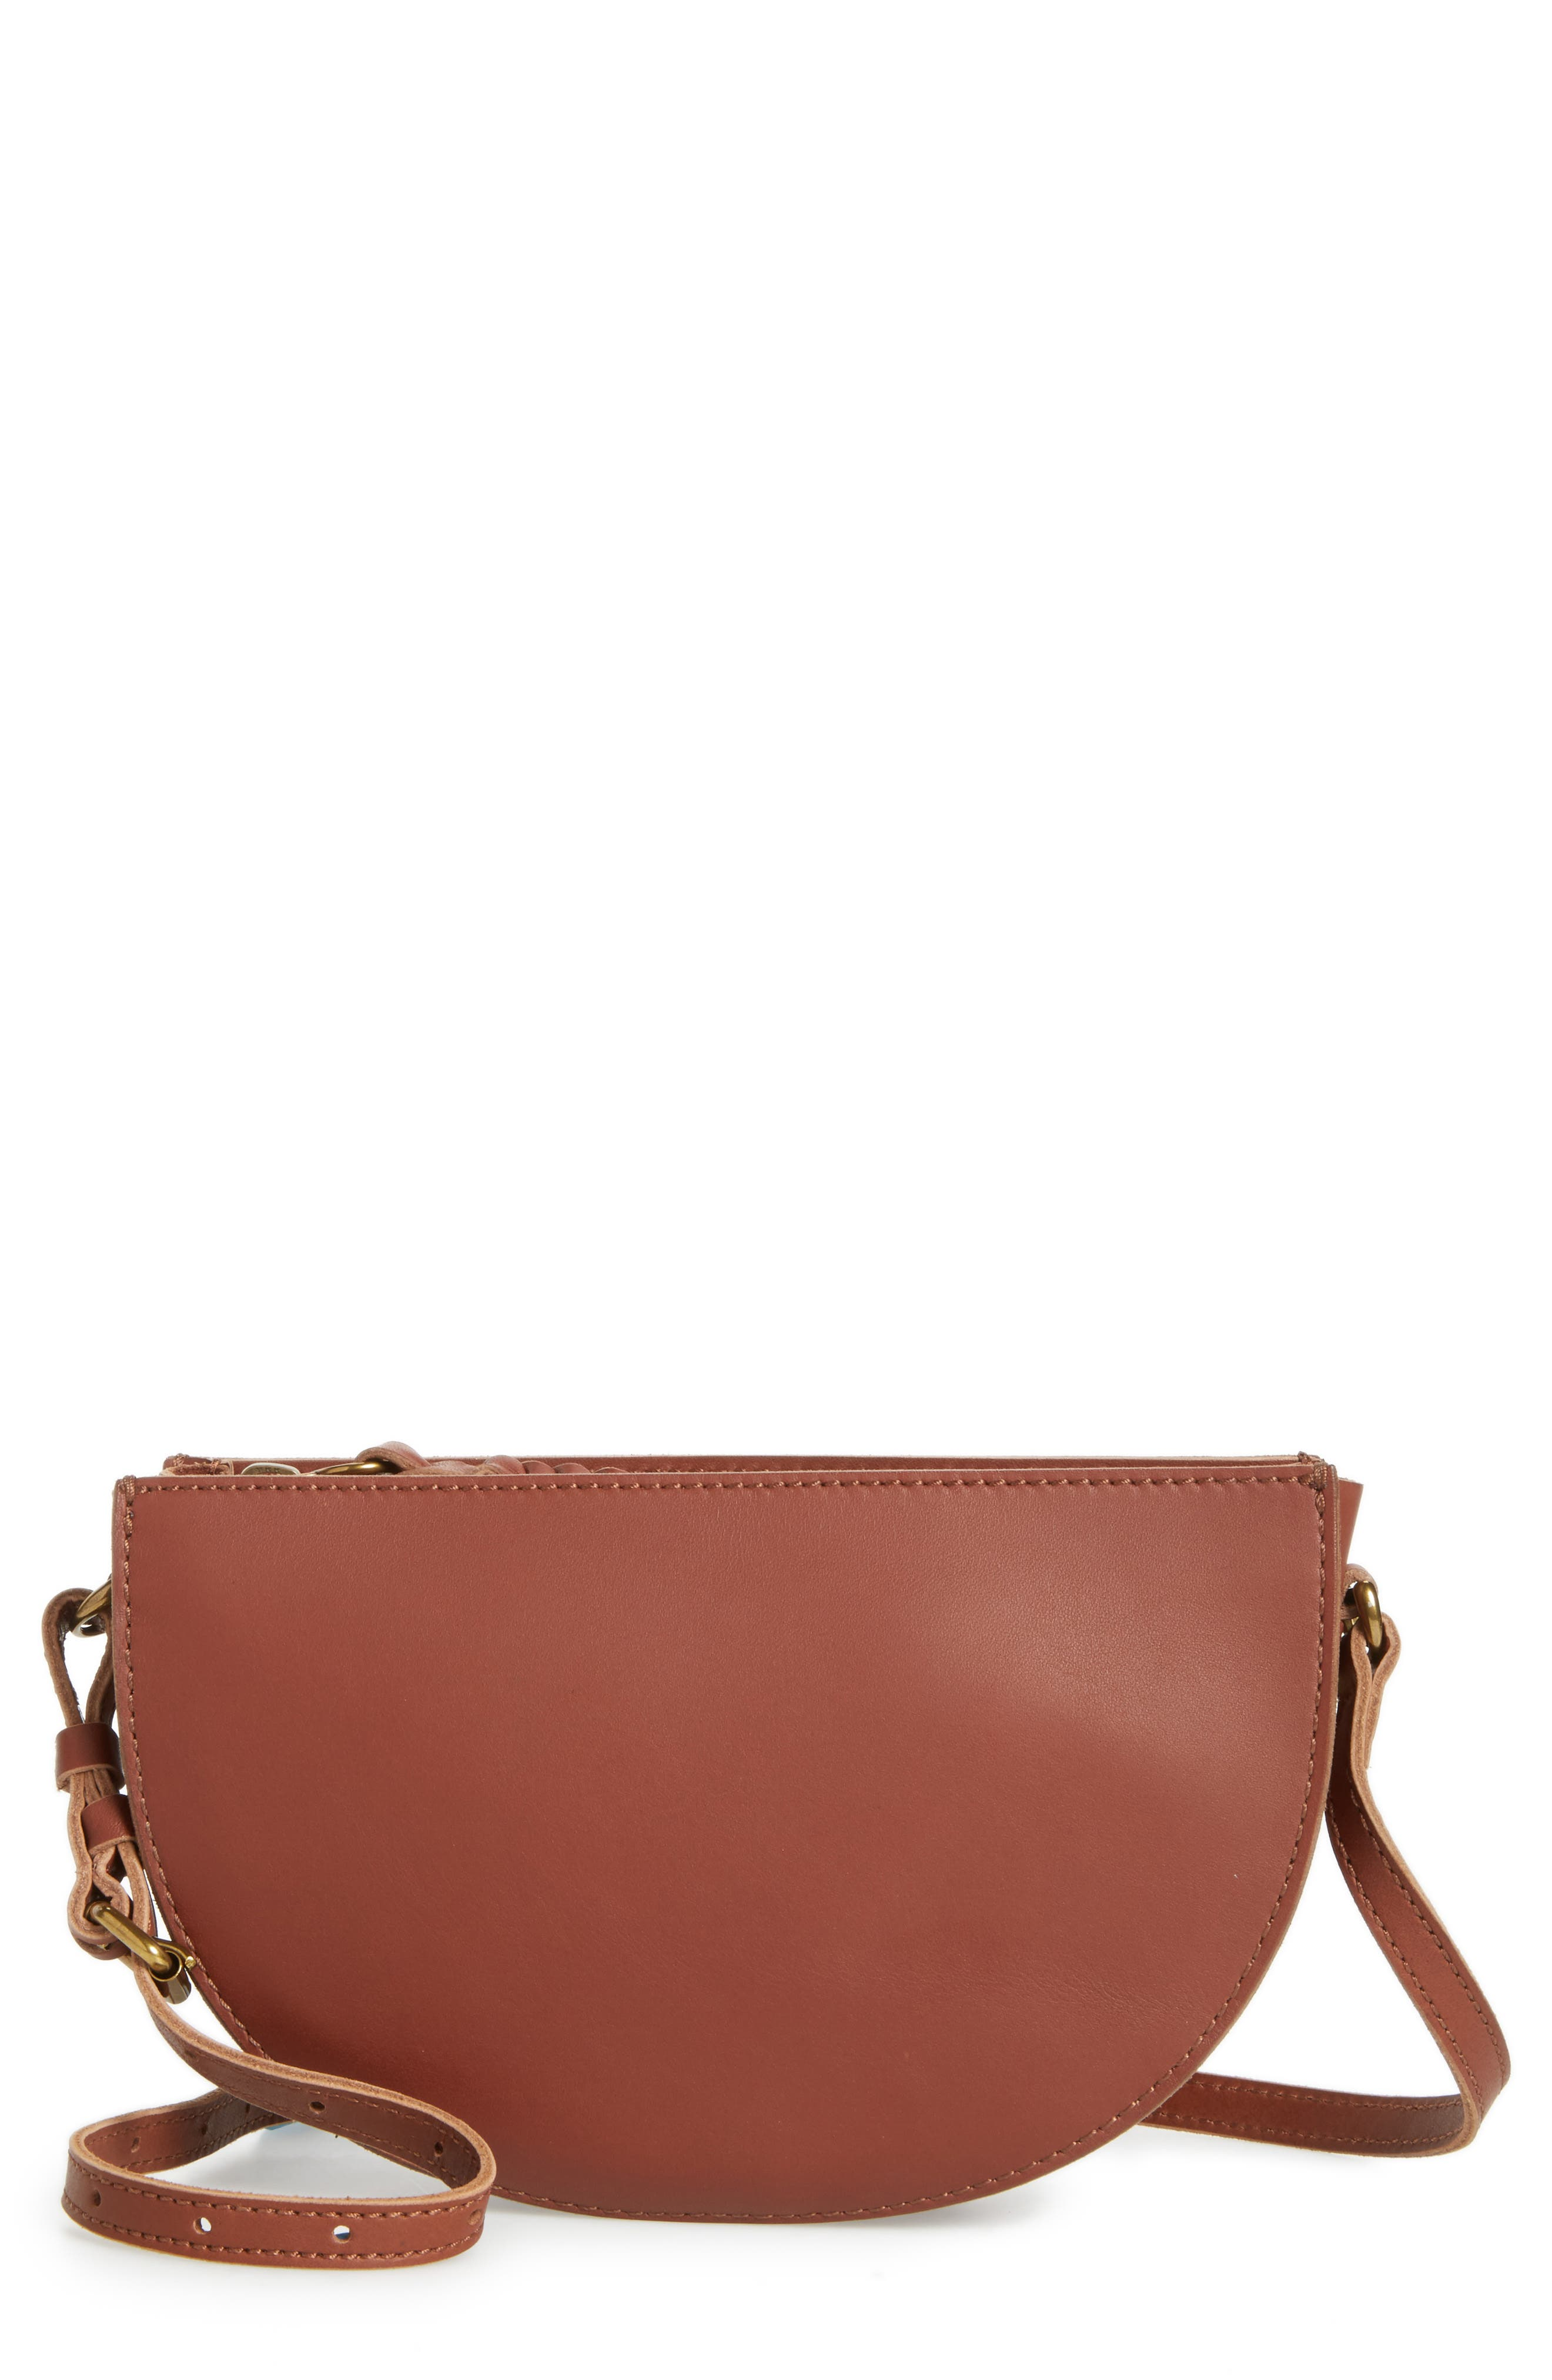 Juniper Vachetta Leather Half Moon Crossbody Bag,                             Main thumbnail 3, color,